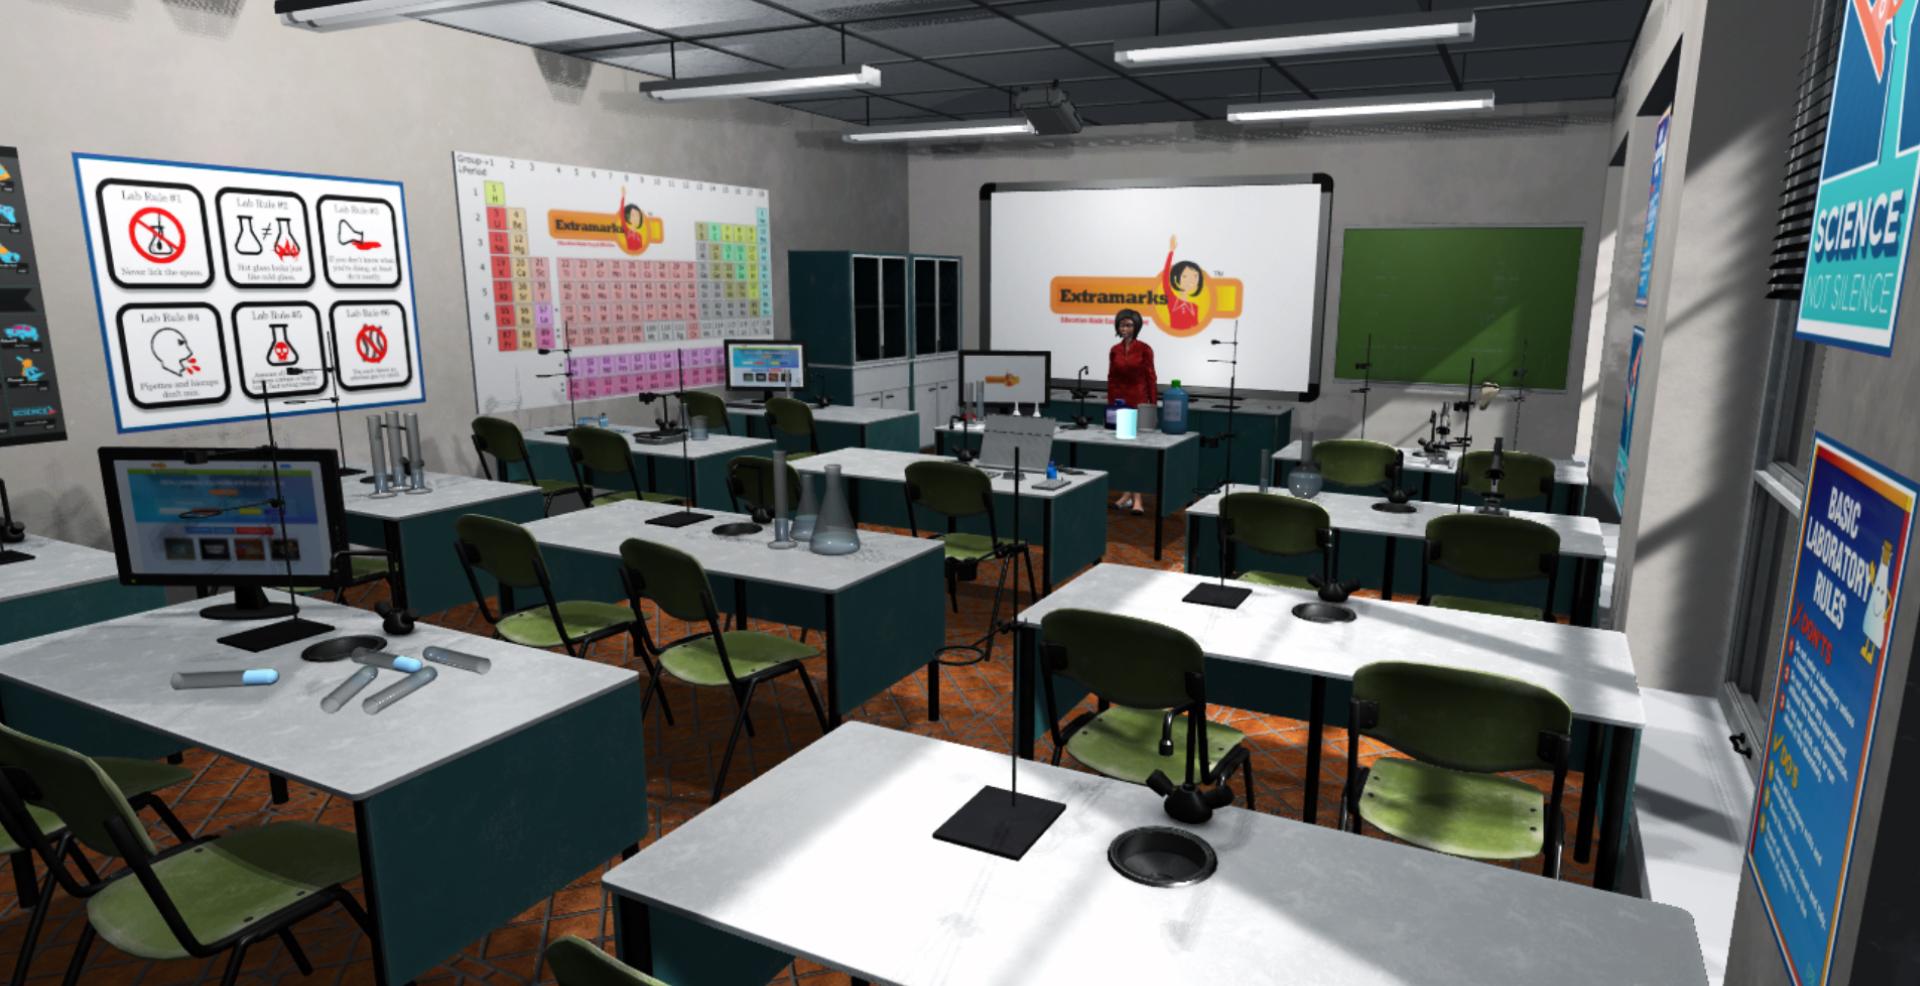 virtual reality education game